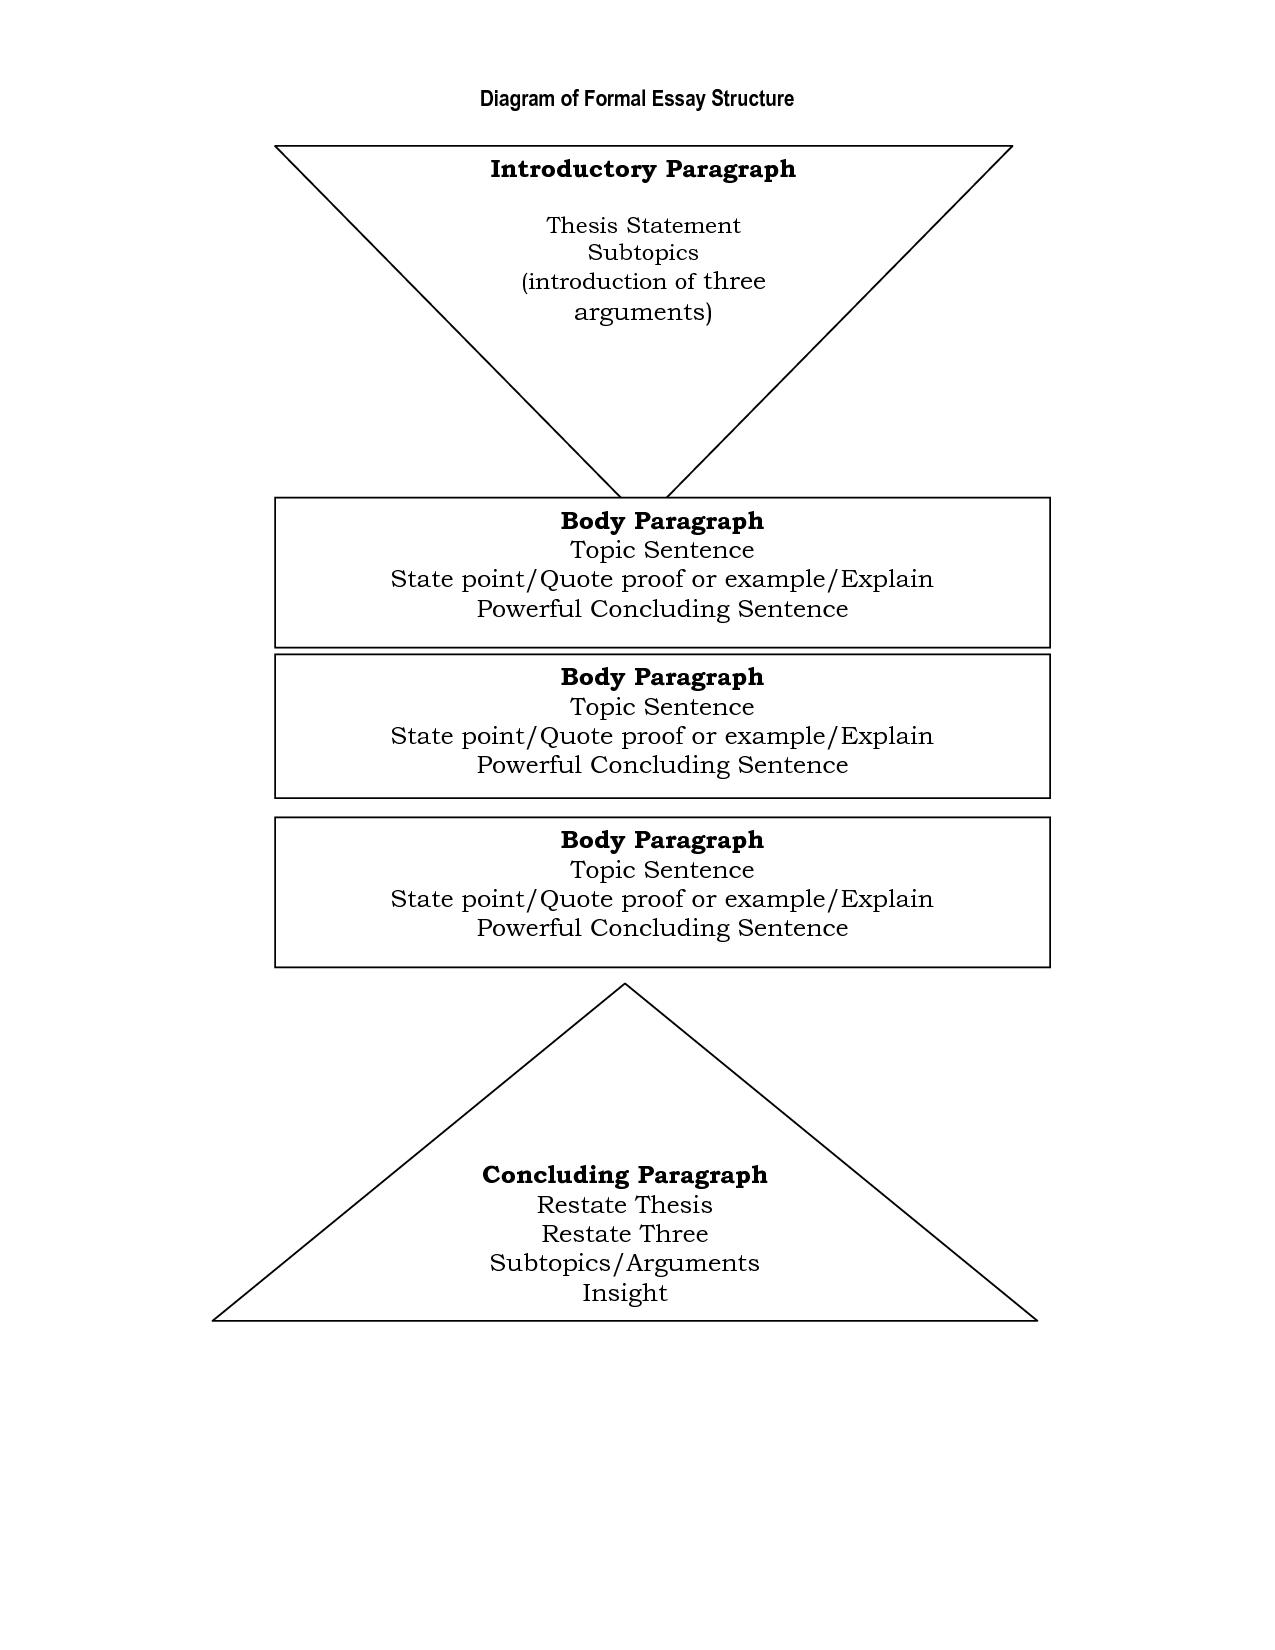 014 Research Essay Structure Paper Outline Apa Para Argumentative Rebuttal Esl Example Igcse Pdf Ielts Qut Ppt Of Breathtaking An (advanced Module) Full